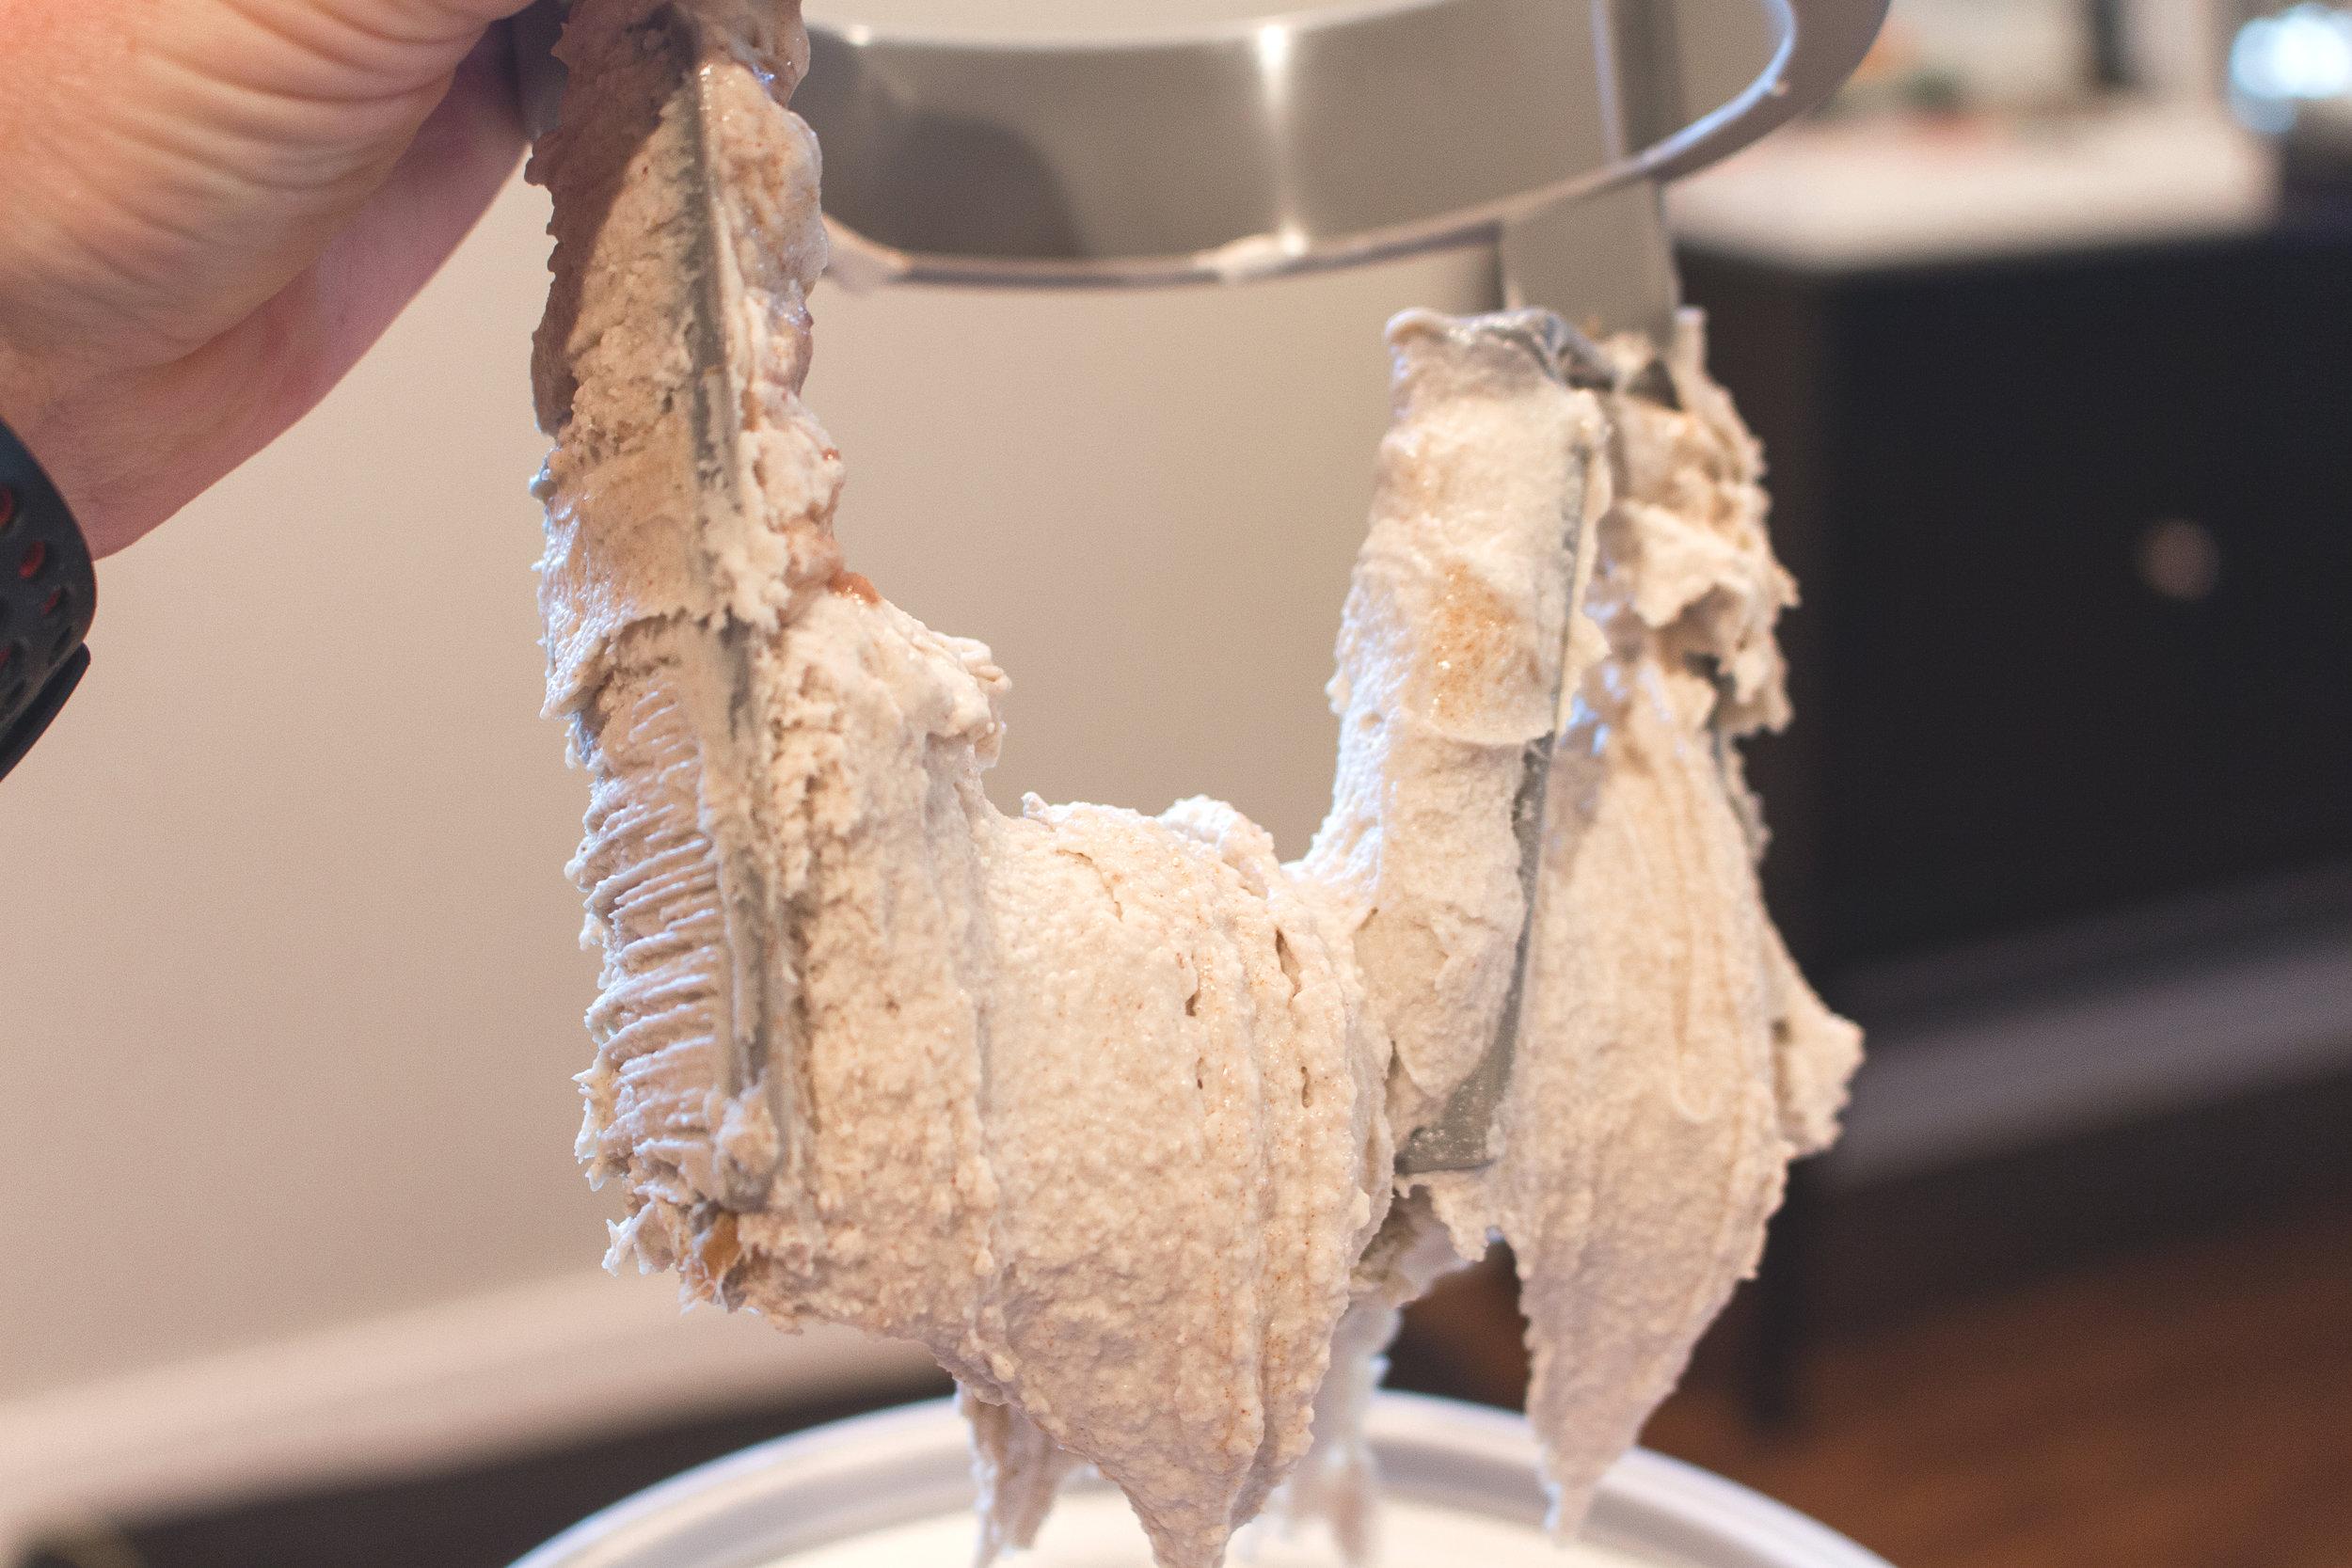 All of It - Roasted Banana Caramel Vegan Ice Cream